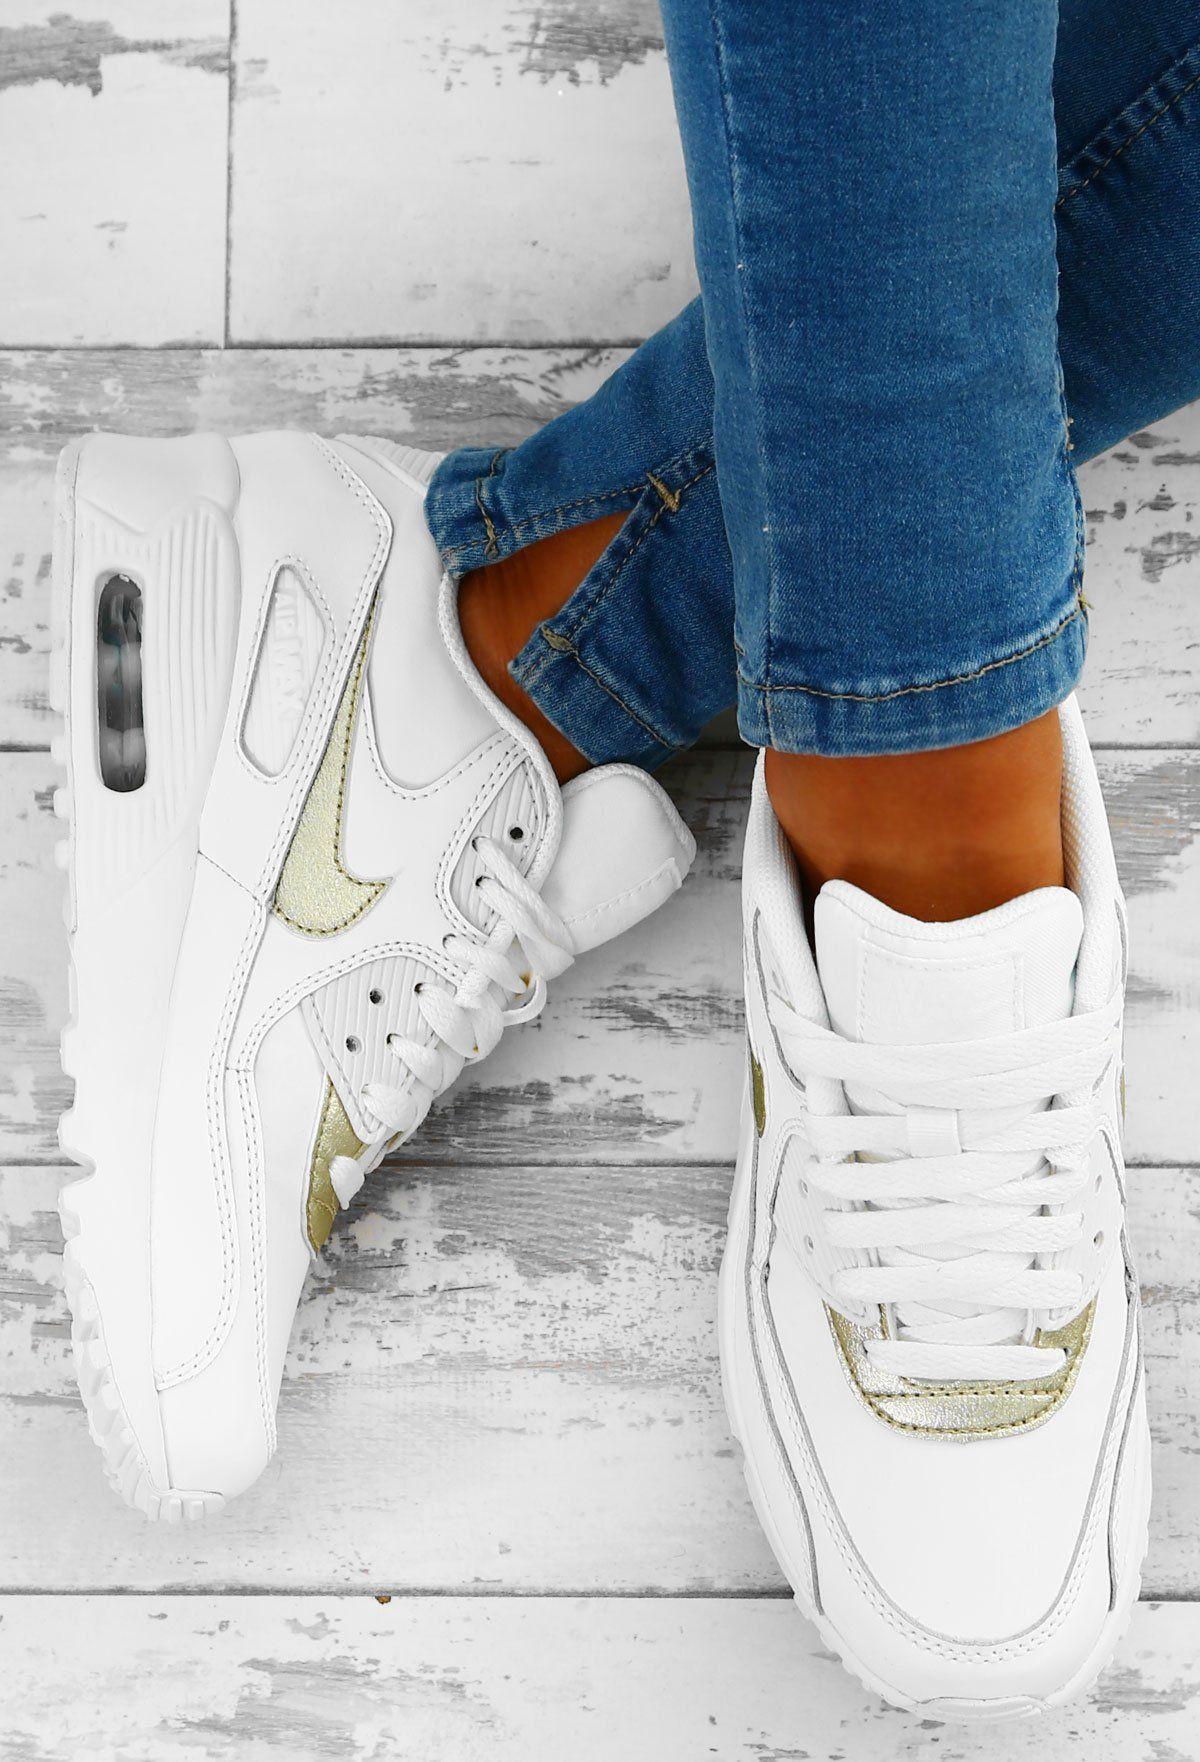 Nike Air Max 90 White and Gold Trainers UK 3 | обувь,сумки